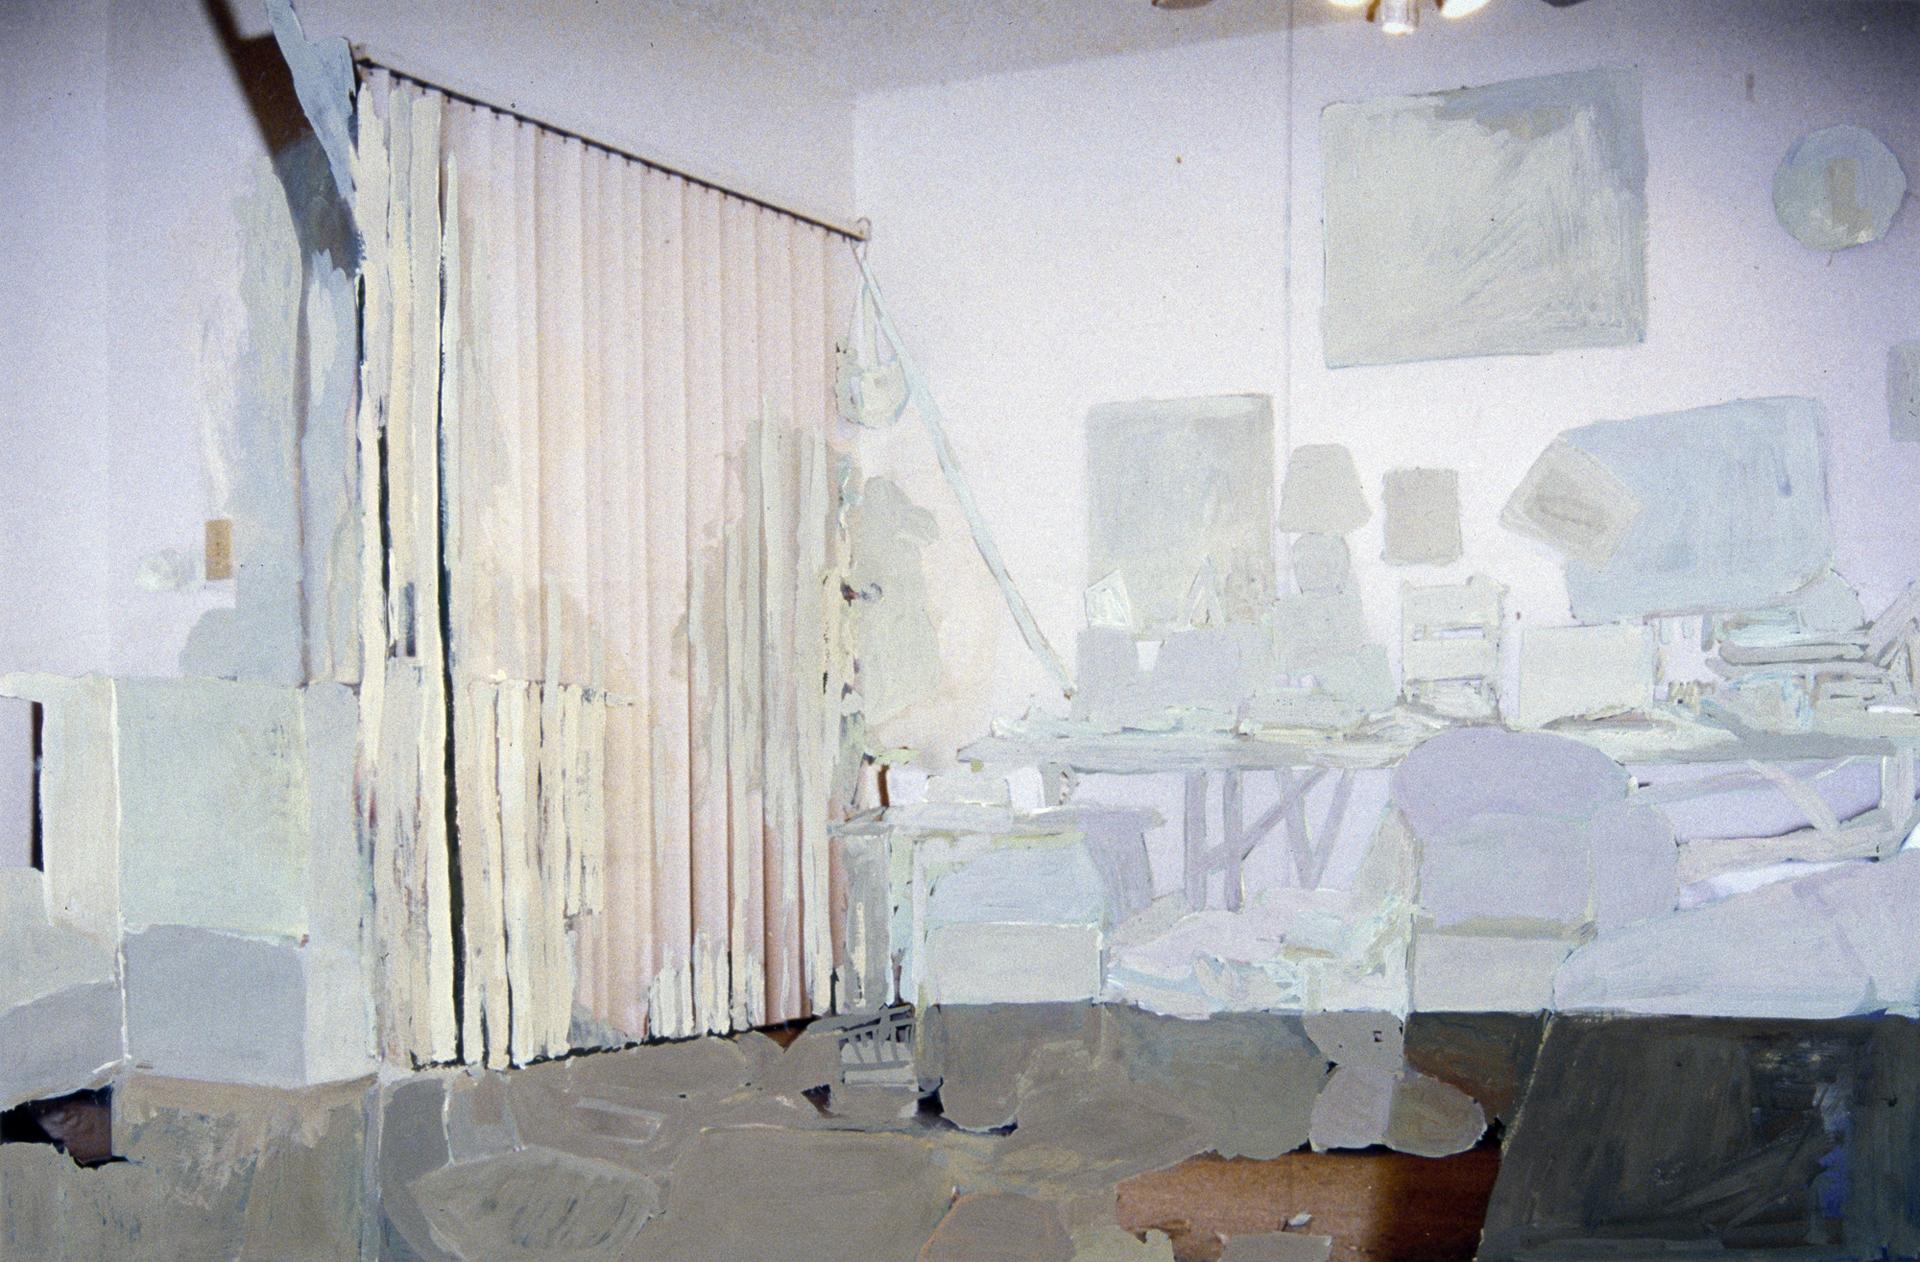 1775 SE Columbia Drive, #203, living room and balcony